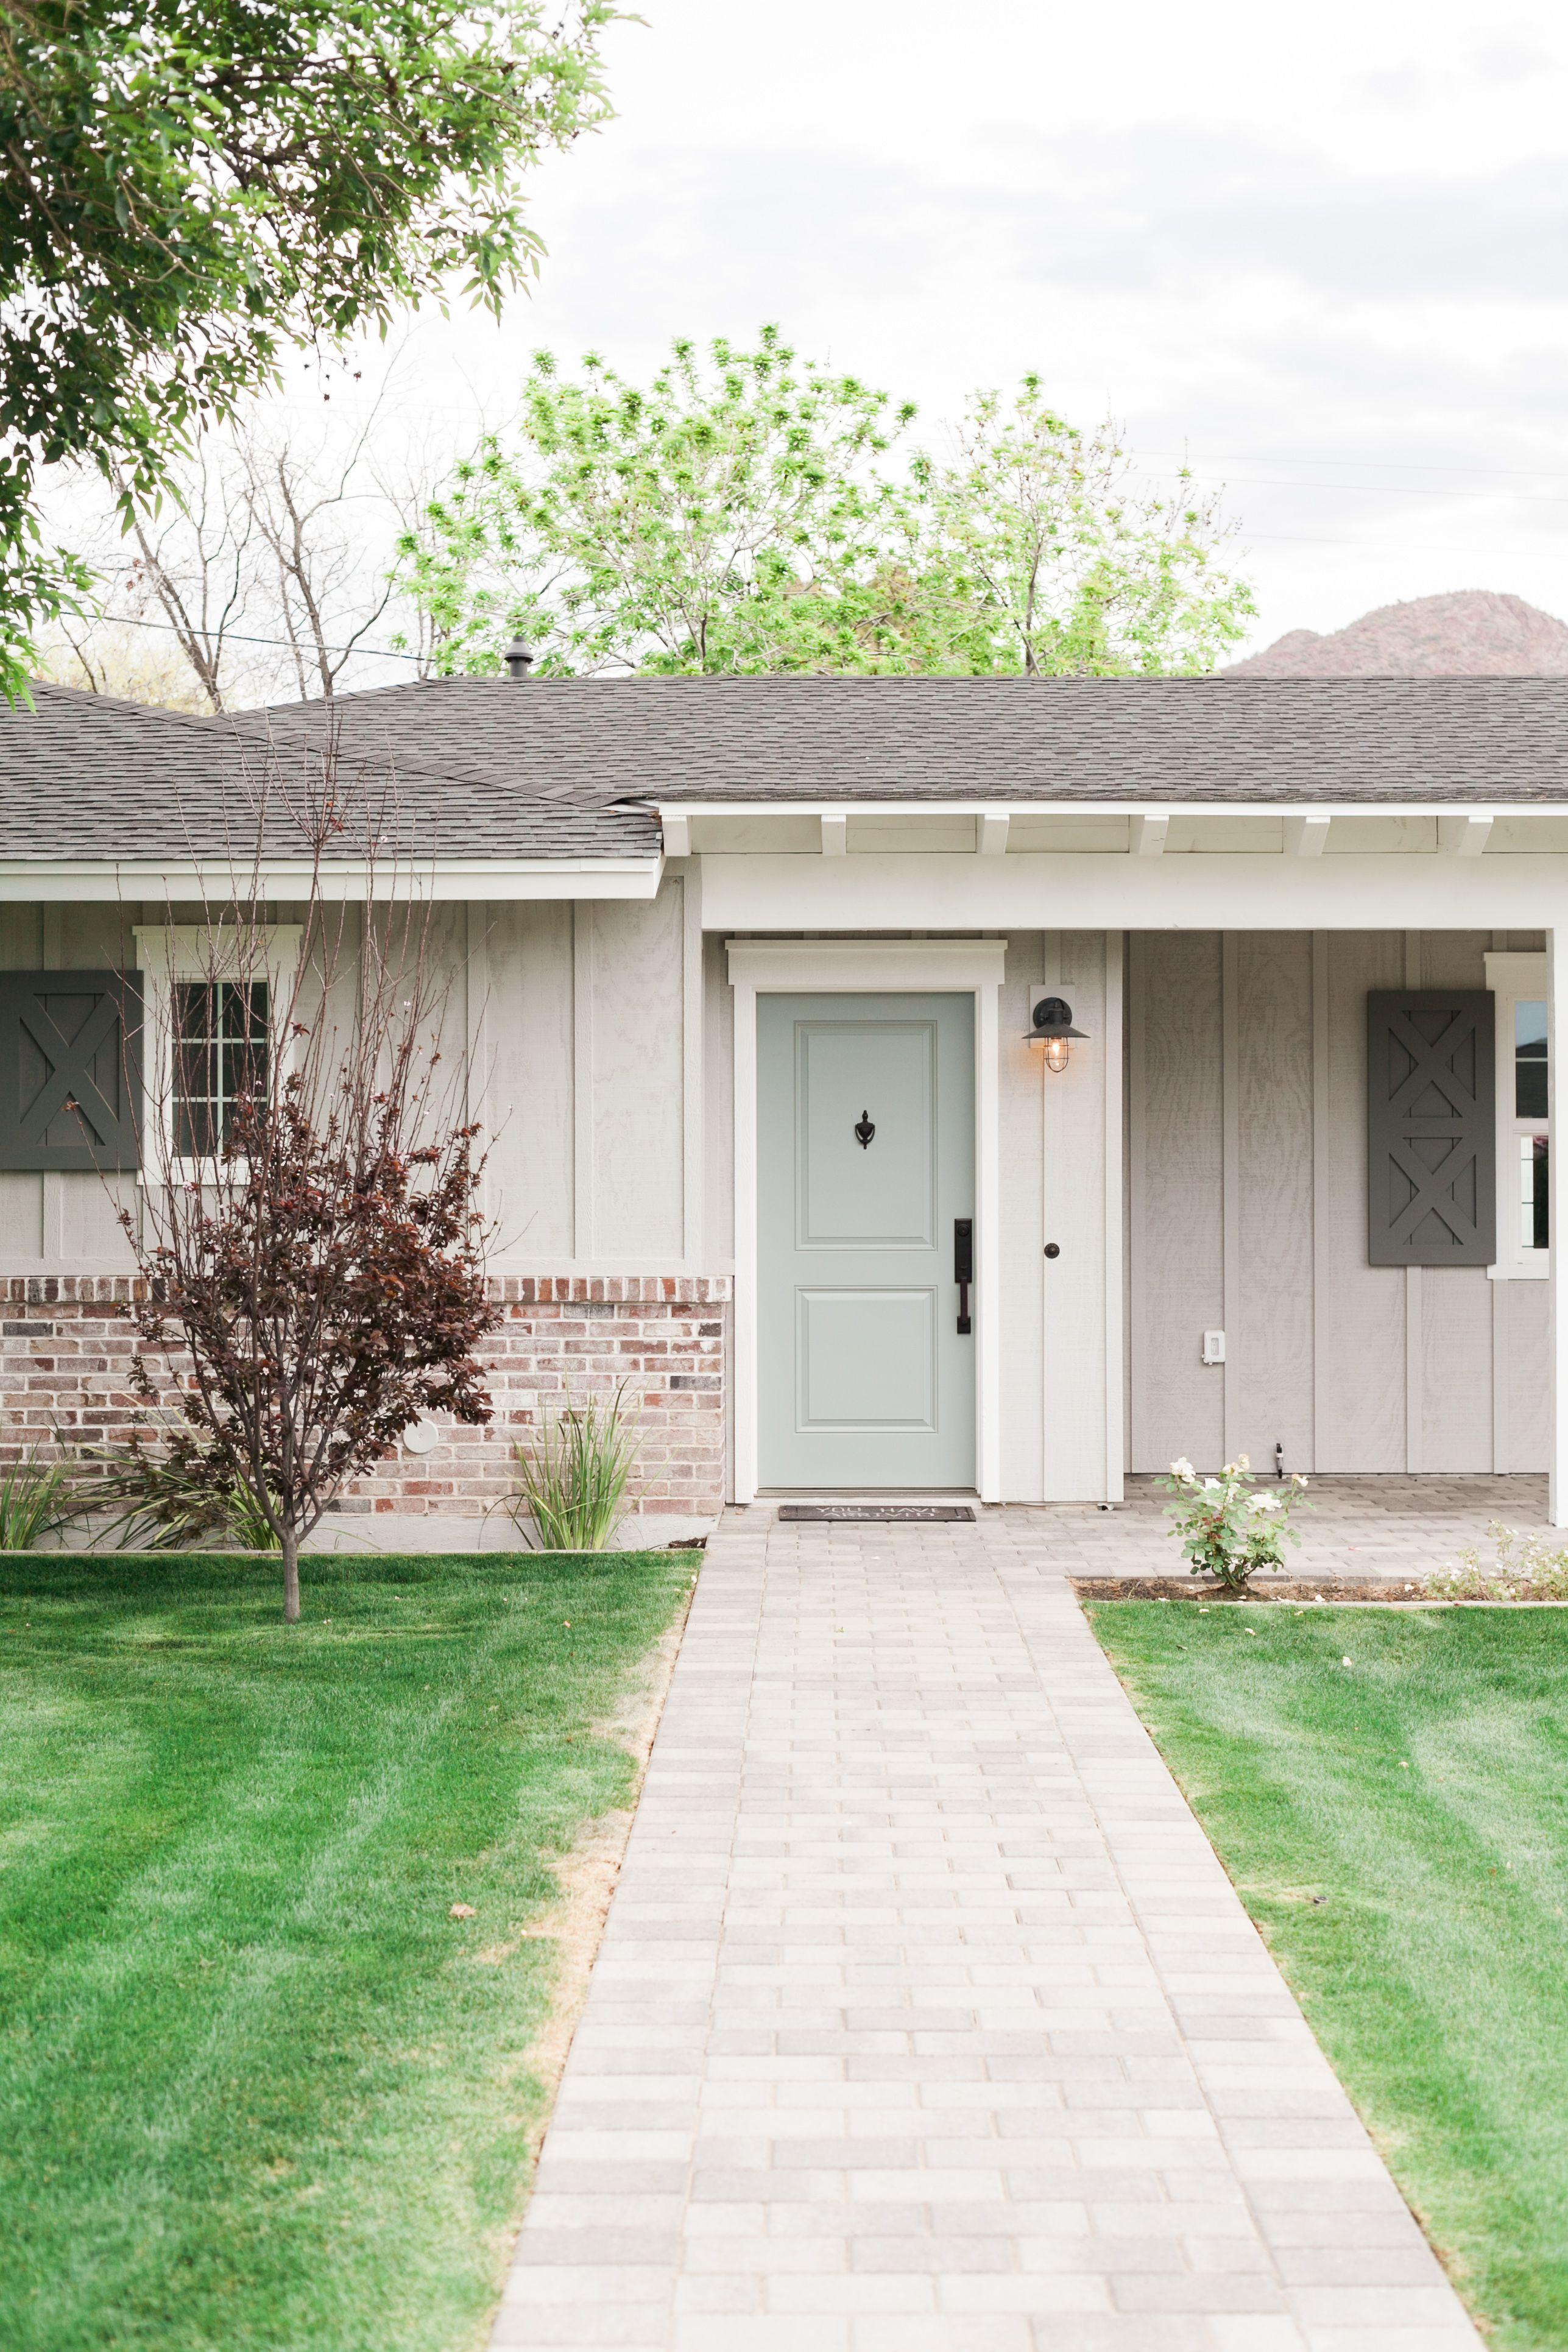 Exterior paint schemes ranch style - Best 25 Ranch Exterior Ideas On Pinterest Ranch Homes Exterior Brick Exterior Makeover And Home Exterior Makeover